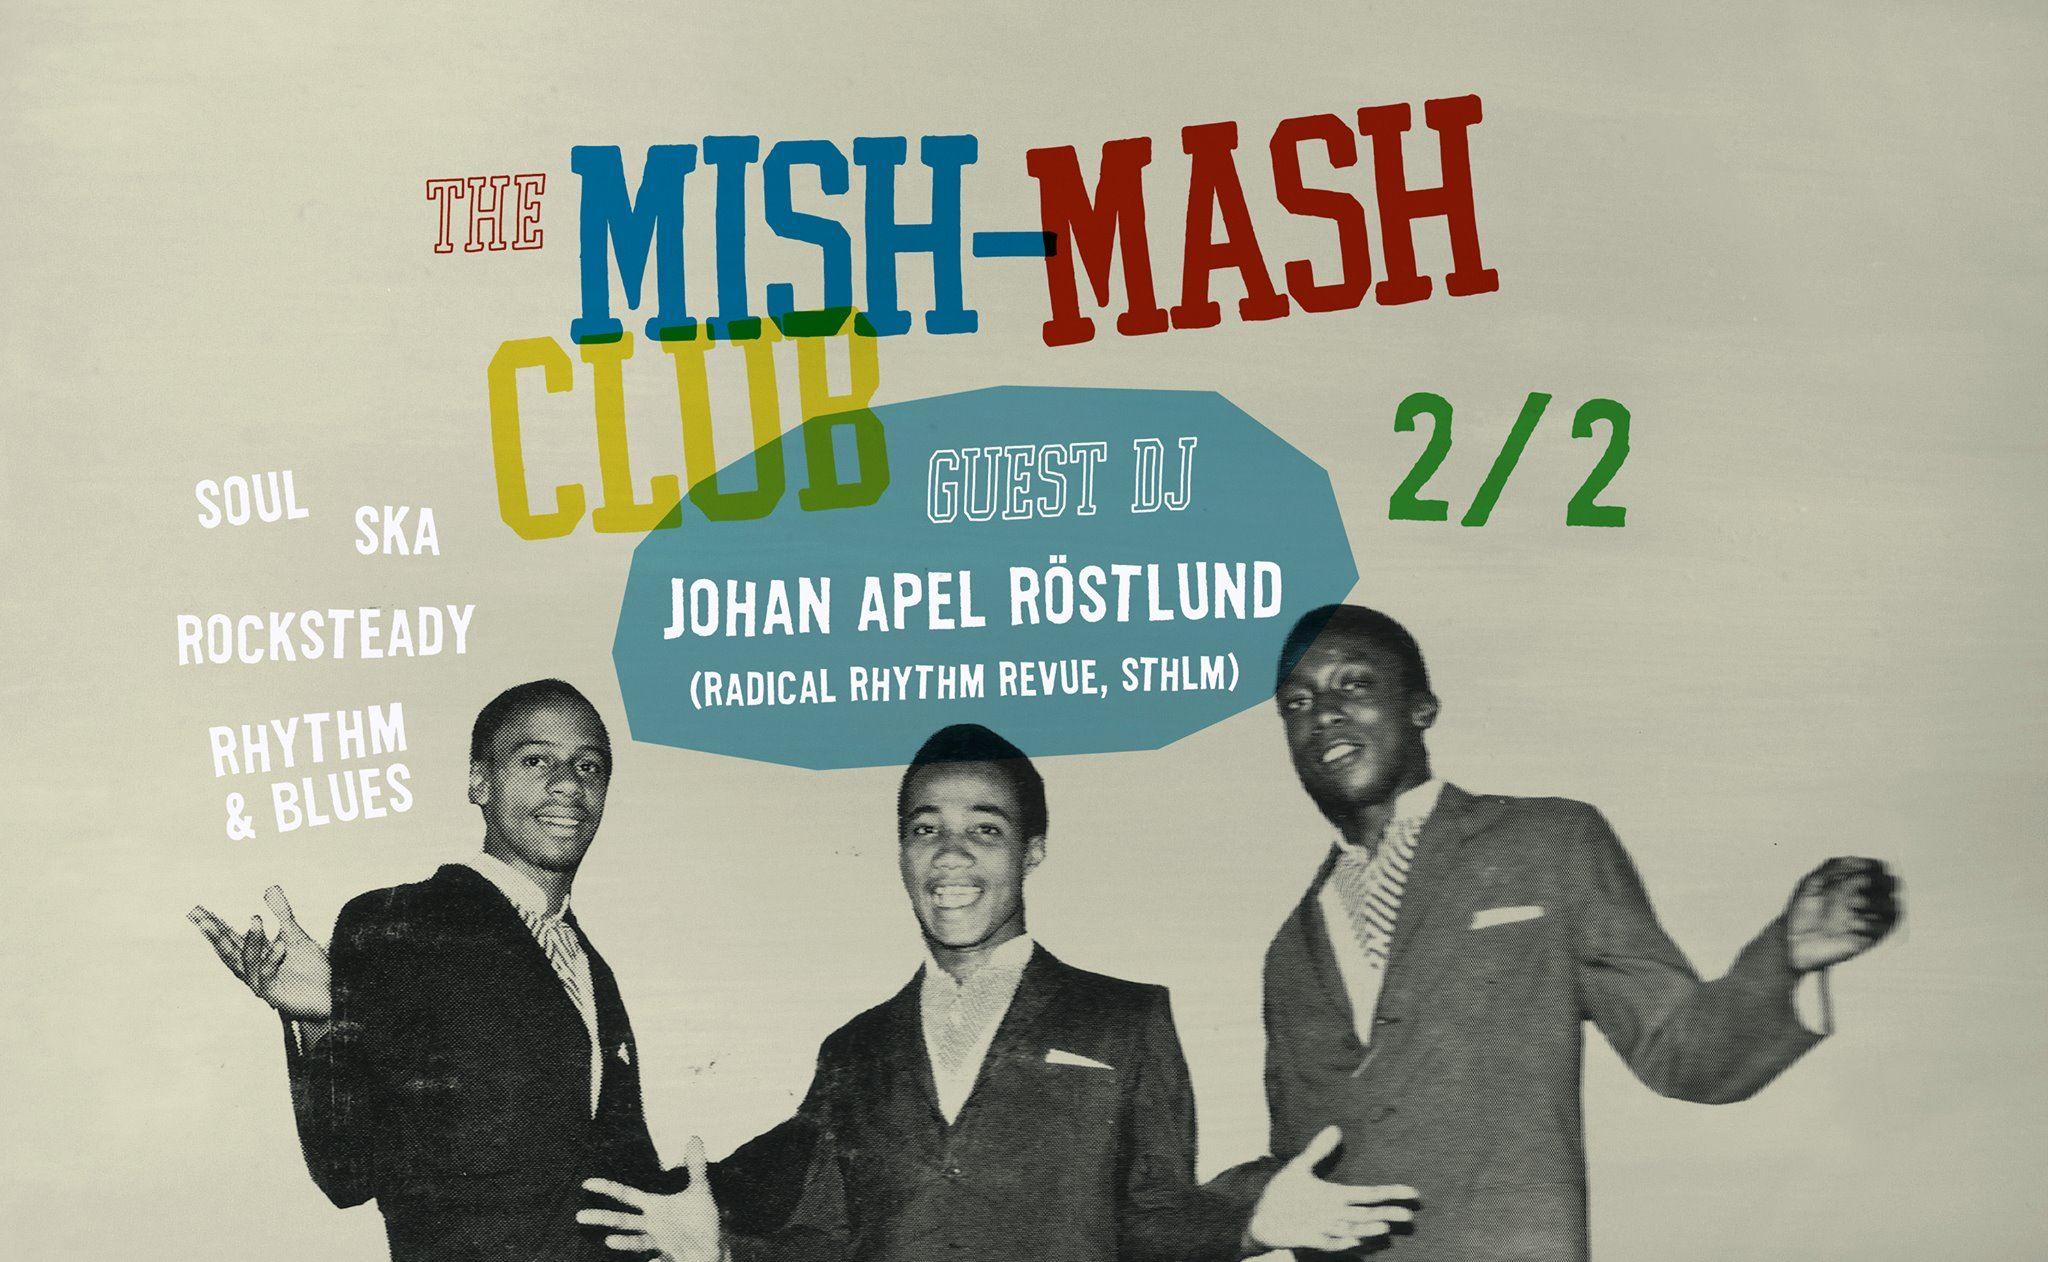 The Mish-Mash Club